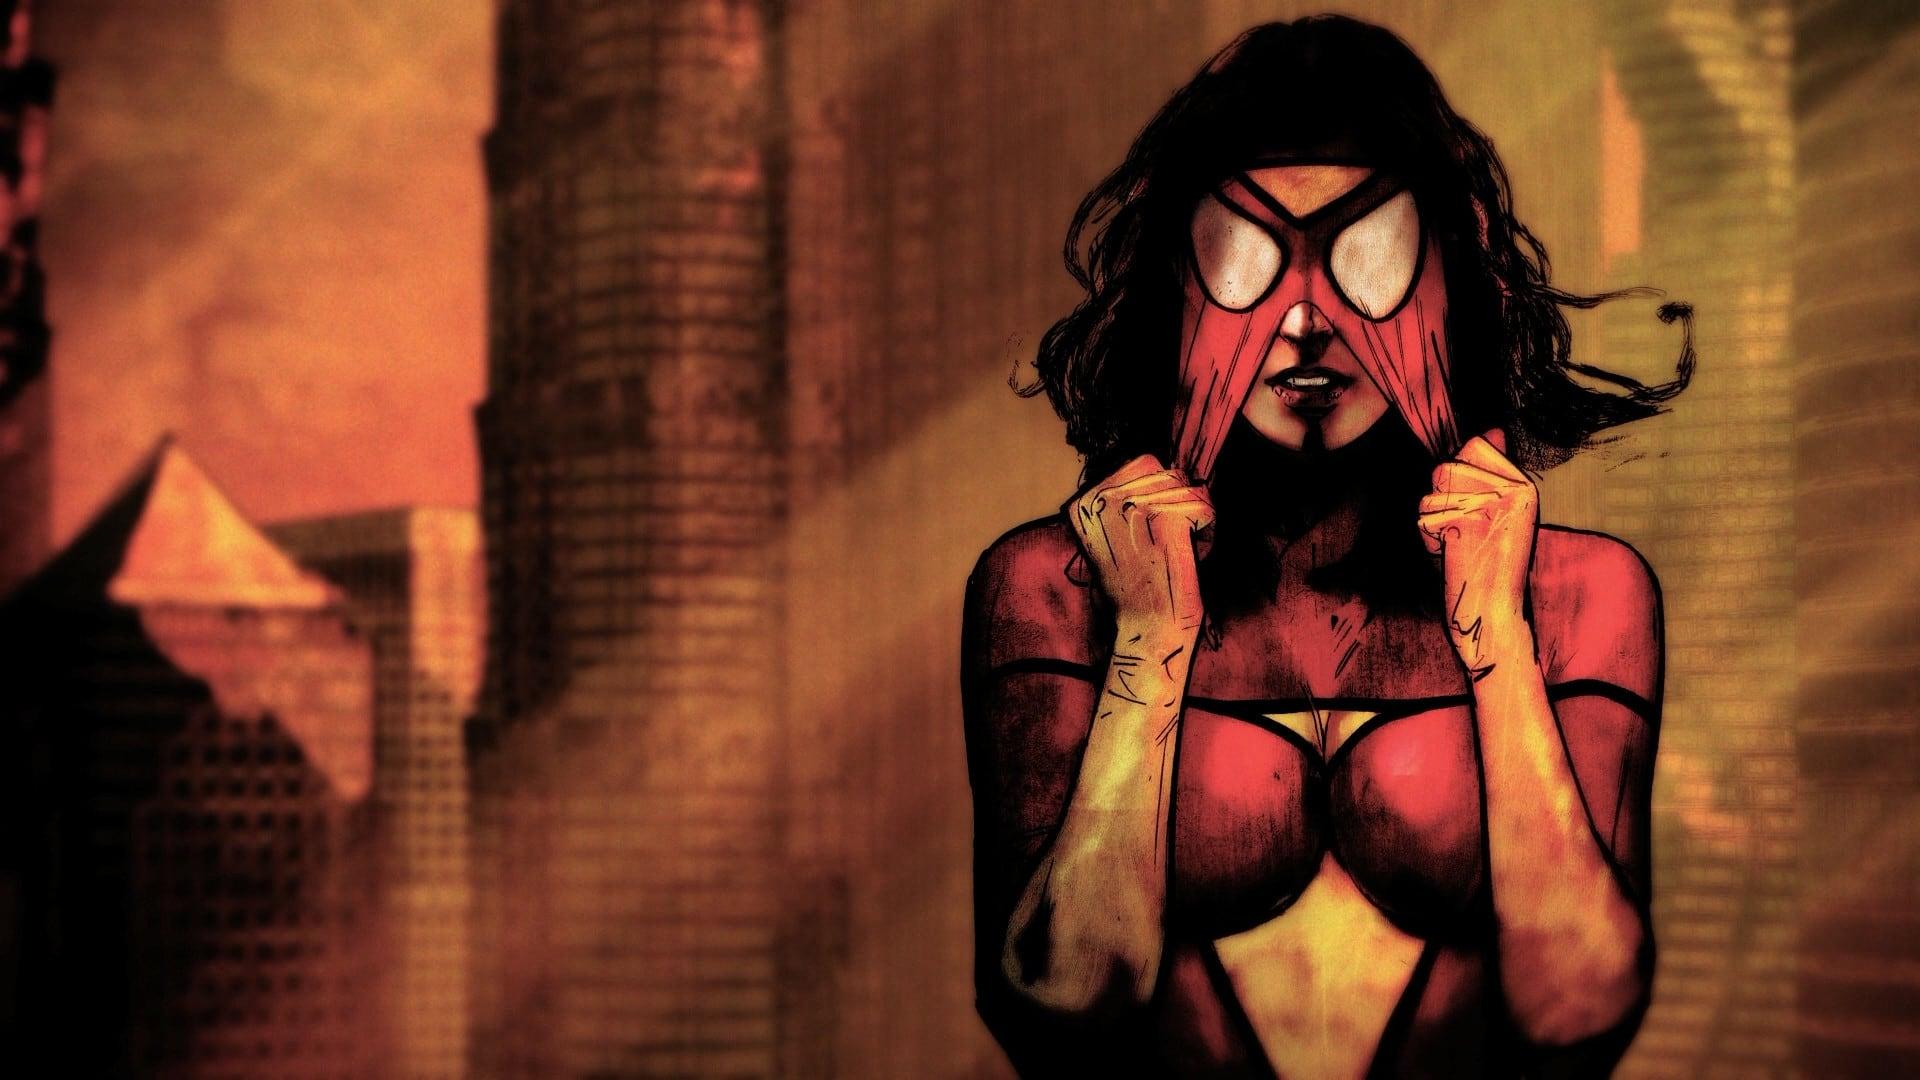 Spider-Woman, Agente de S.W.O.R.D